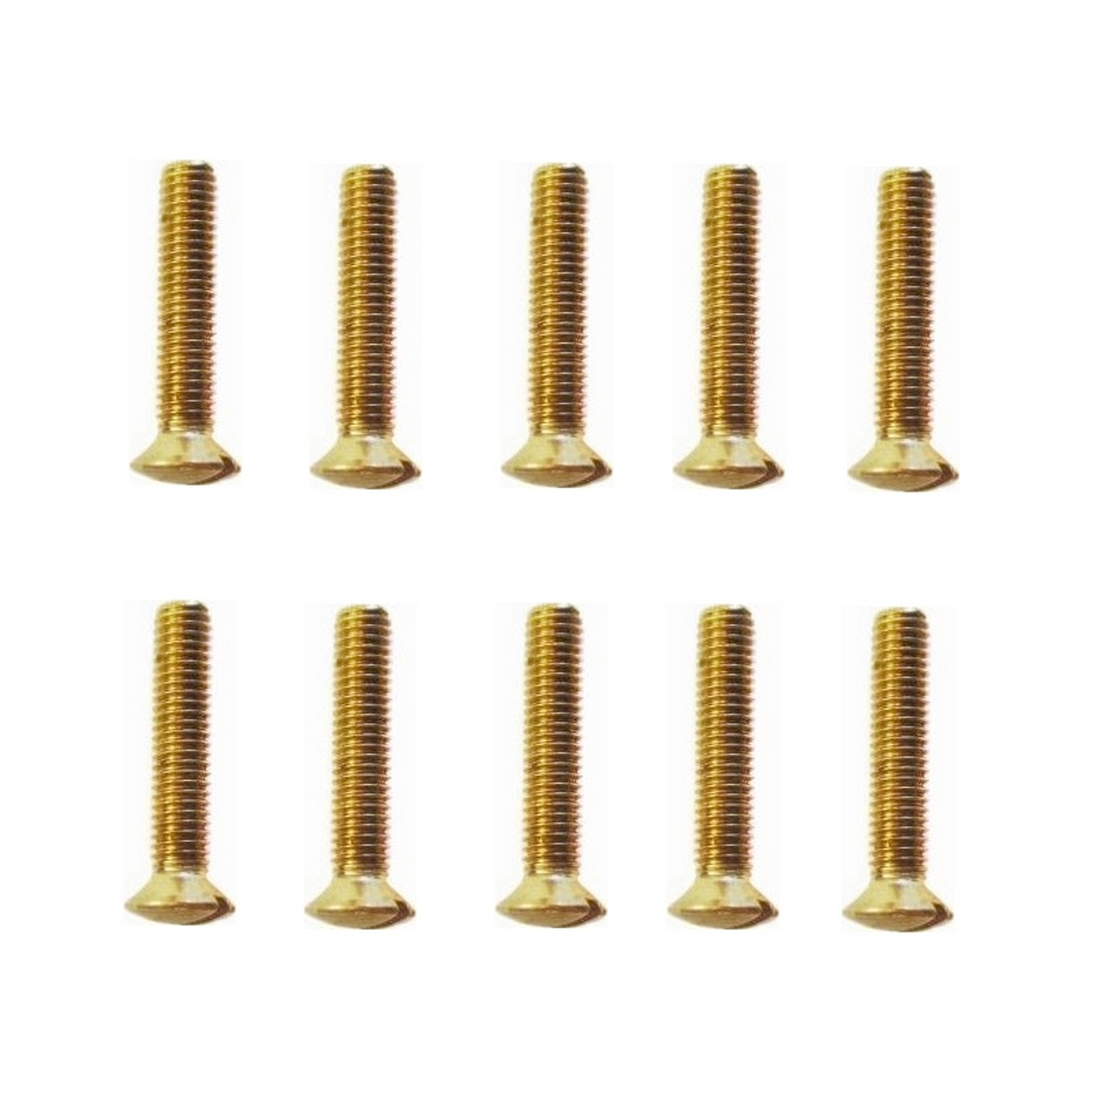 Linsensenkschrauben Messing Gewindeschrauben DIN964 M3x25mm 10 Stück (0212)